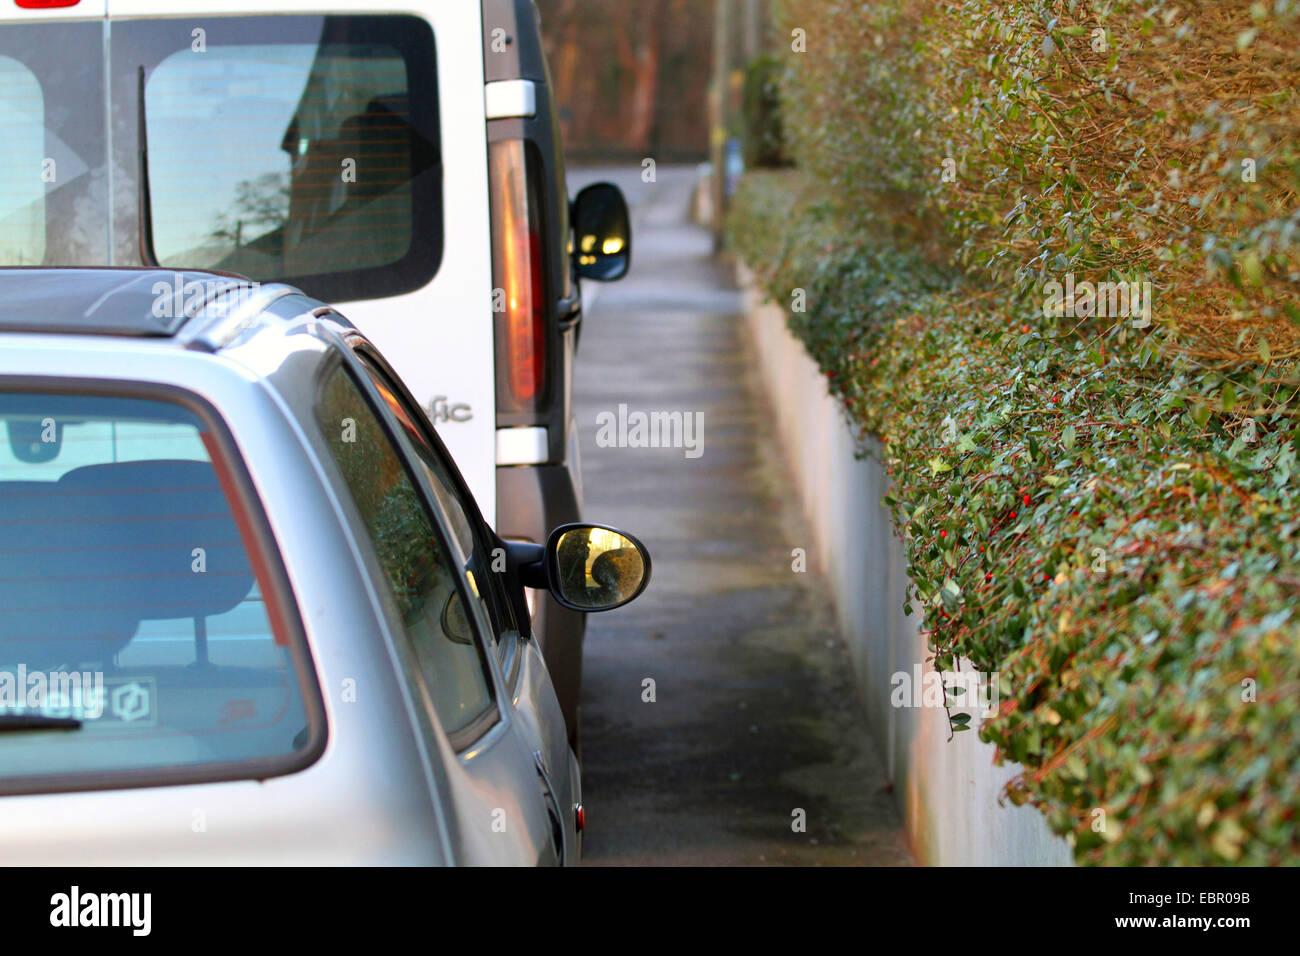 parked cars on sidewalk, Germany - Stock Image